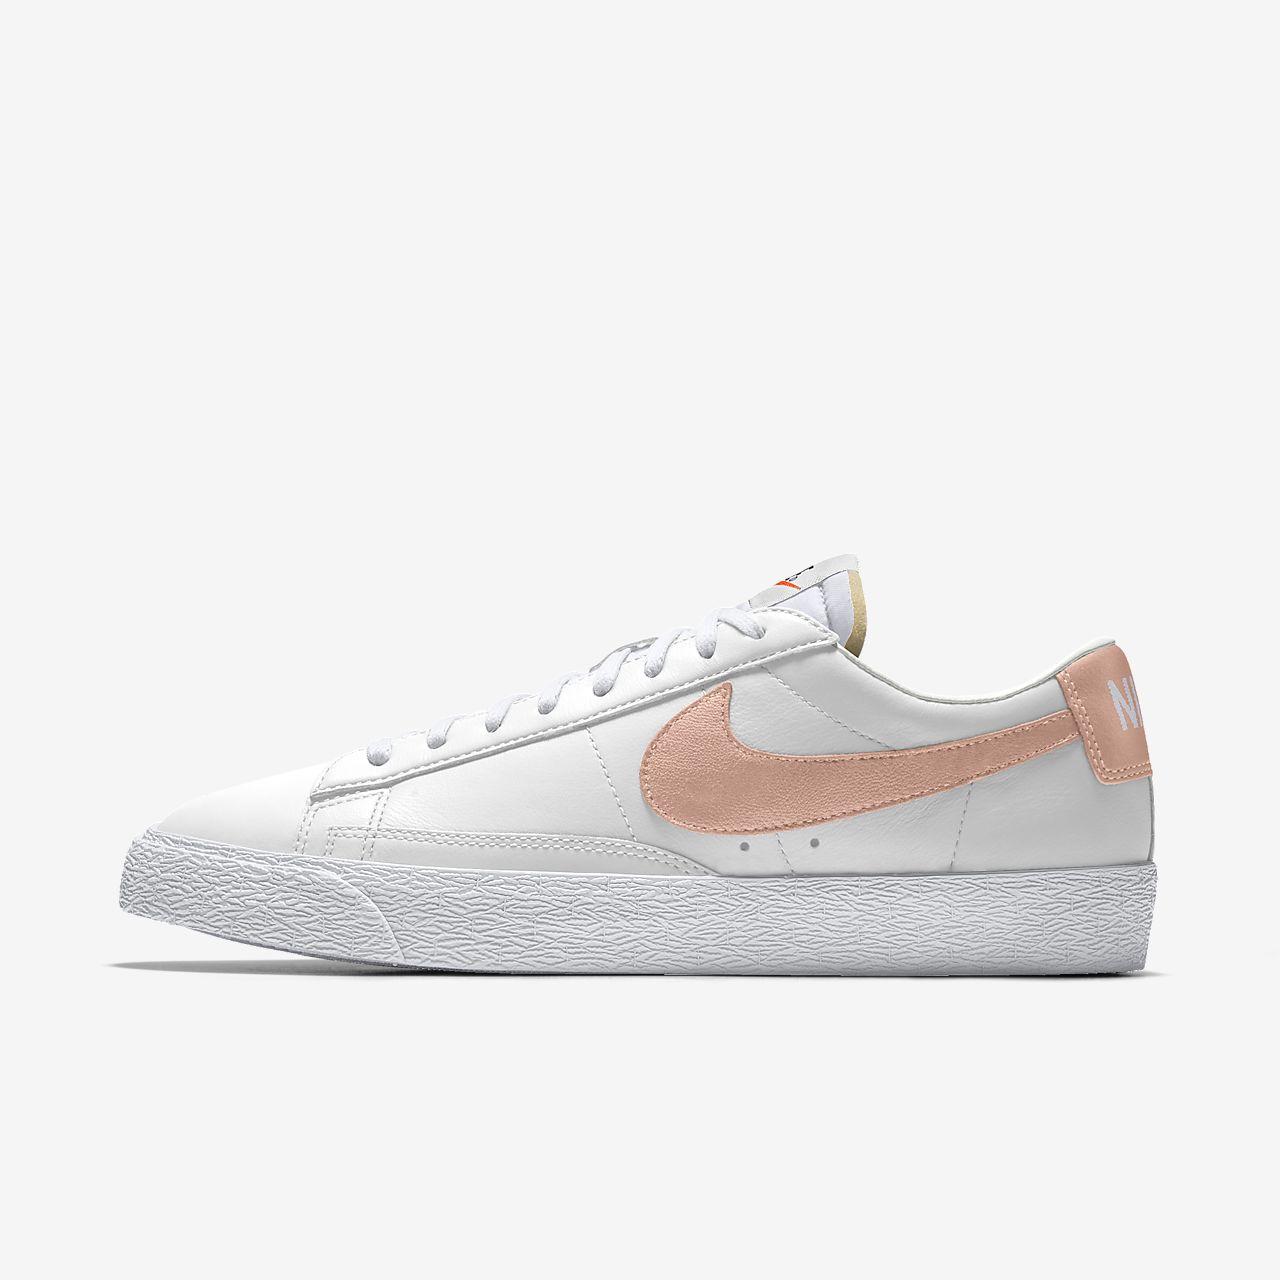 Nike Blazer Low By You Zapatillas personalizables - Mujer